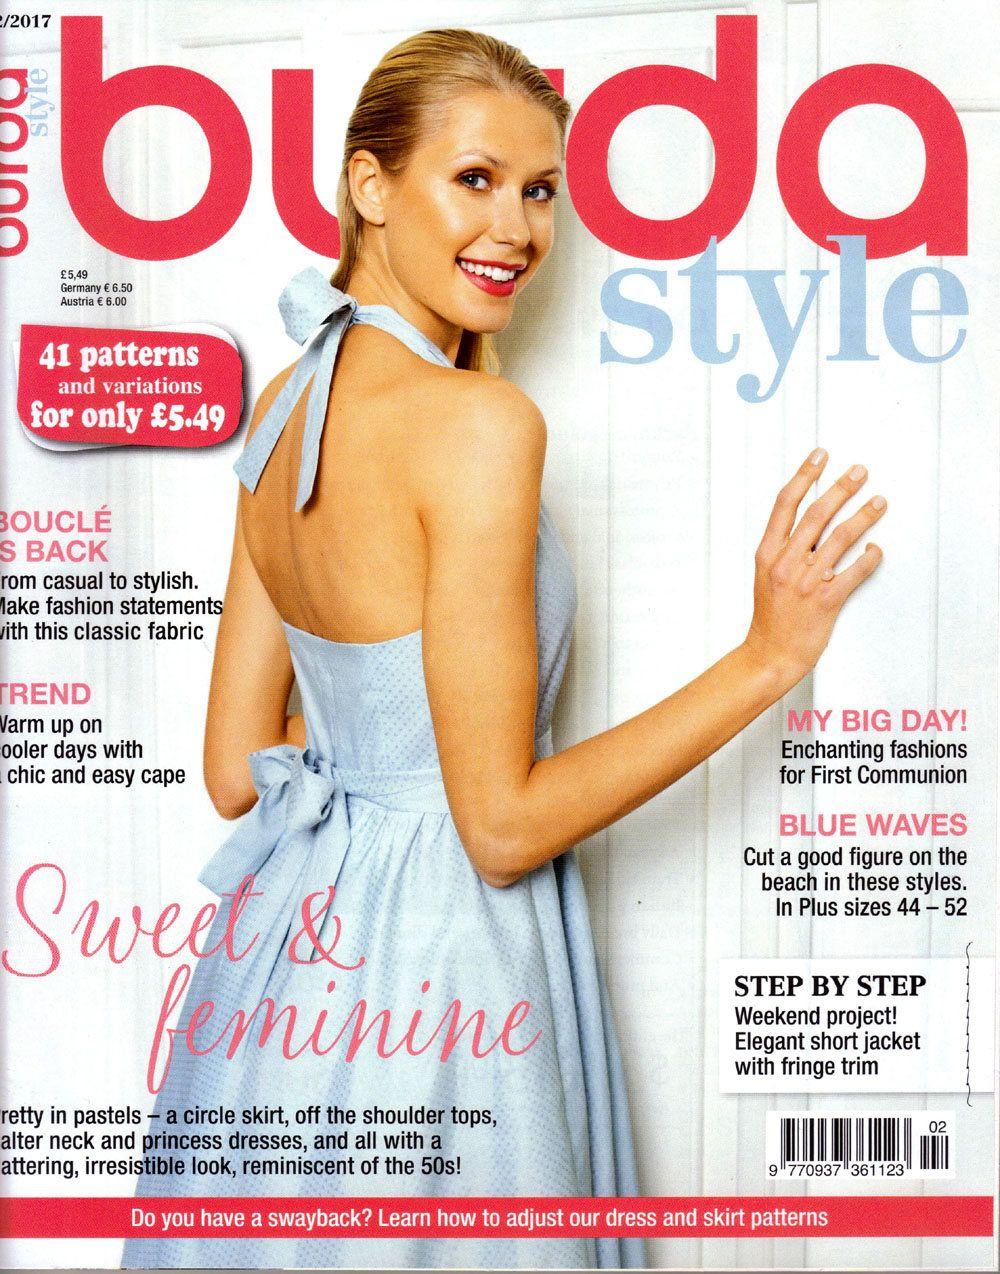 Burda style magazine 22017 english sewing patterns by burda style magazine 22017 english sewing patterns by honeyjamsuniques on etsy jeuxipadfo Image collections